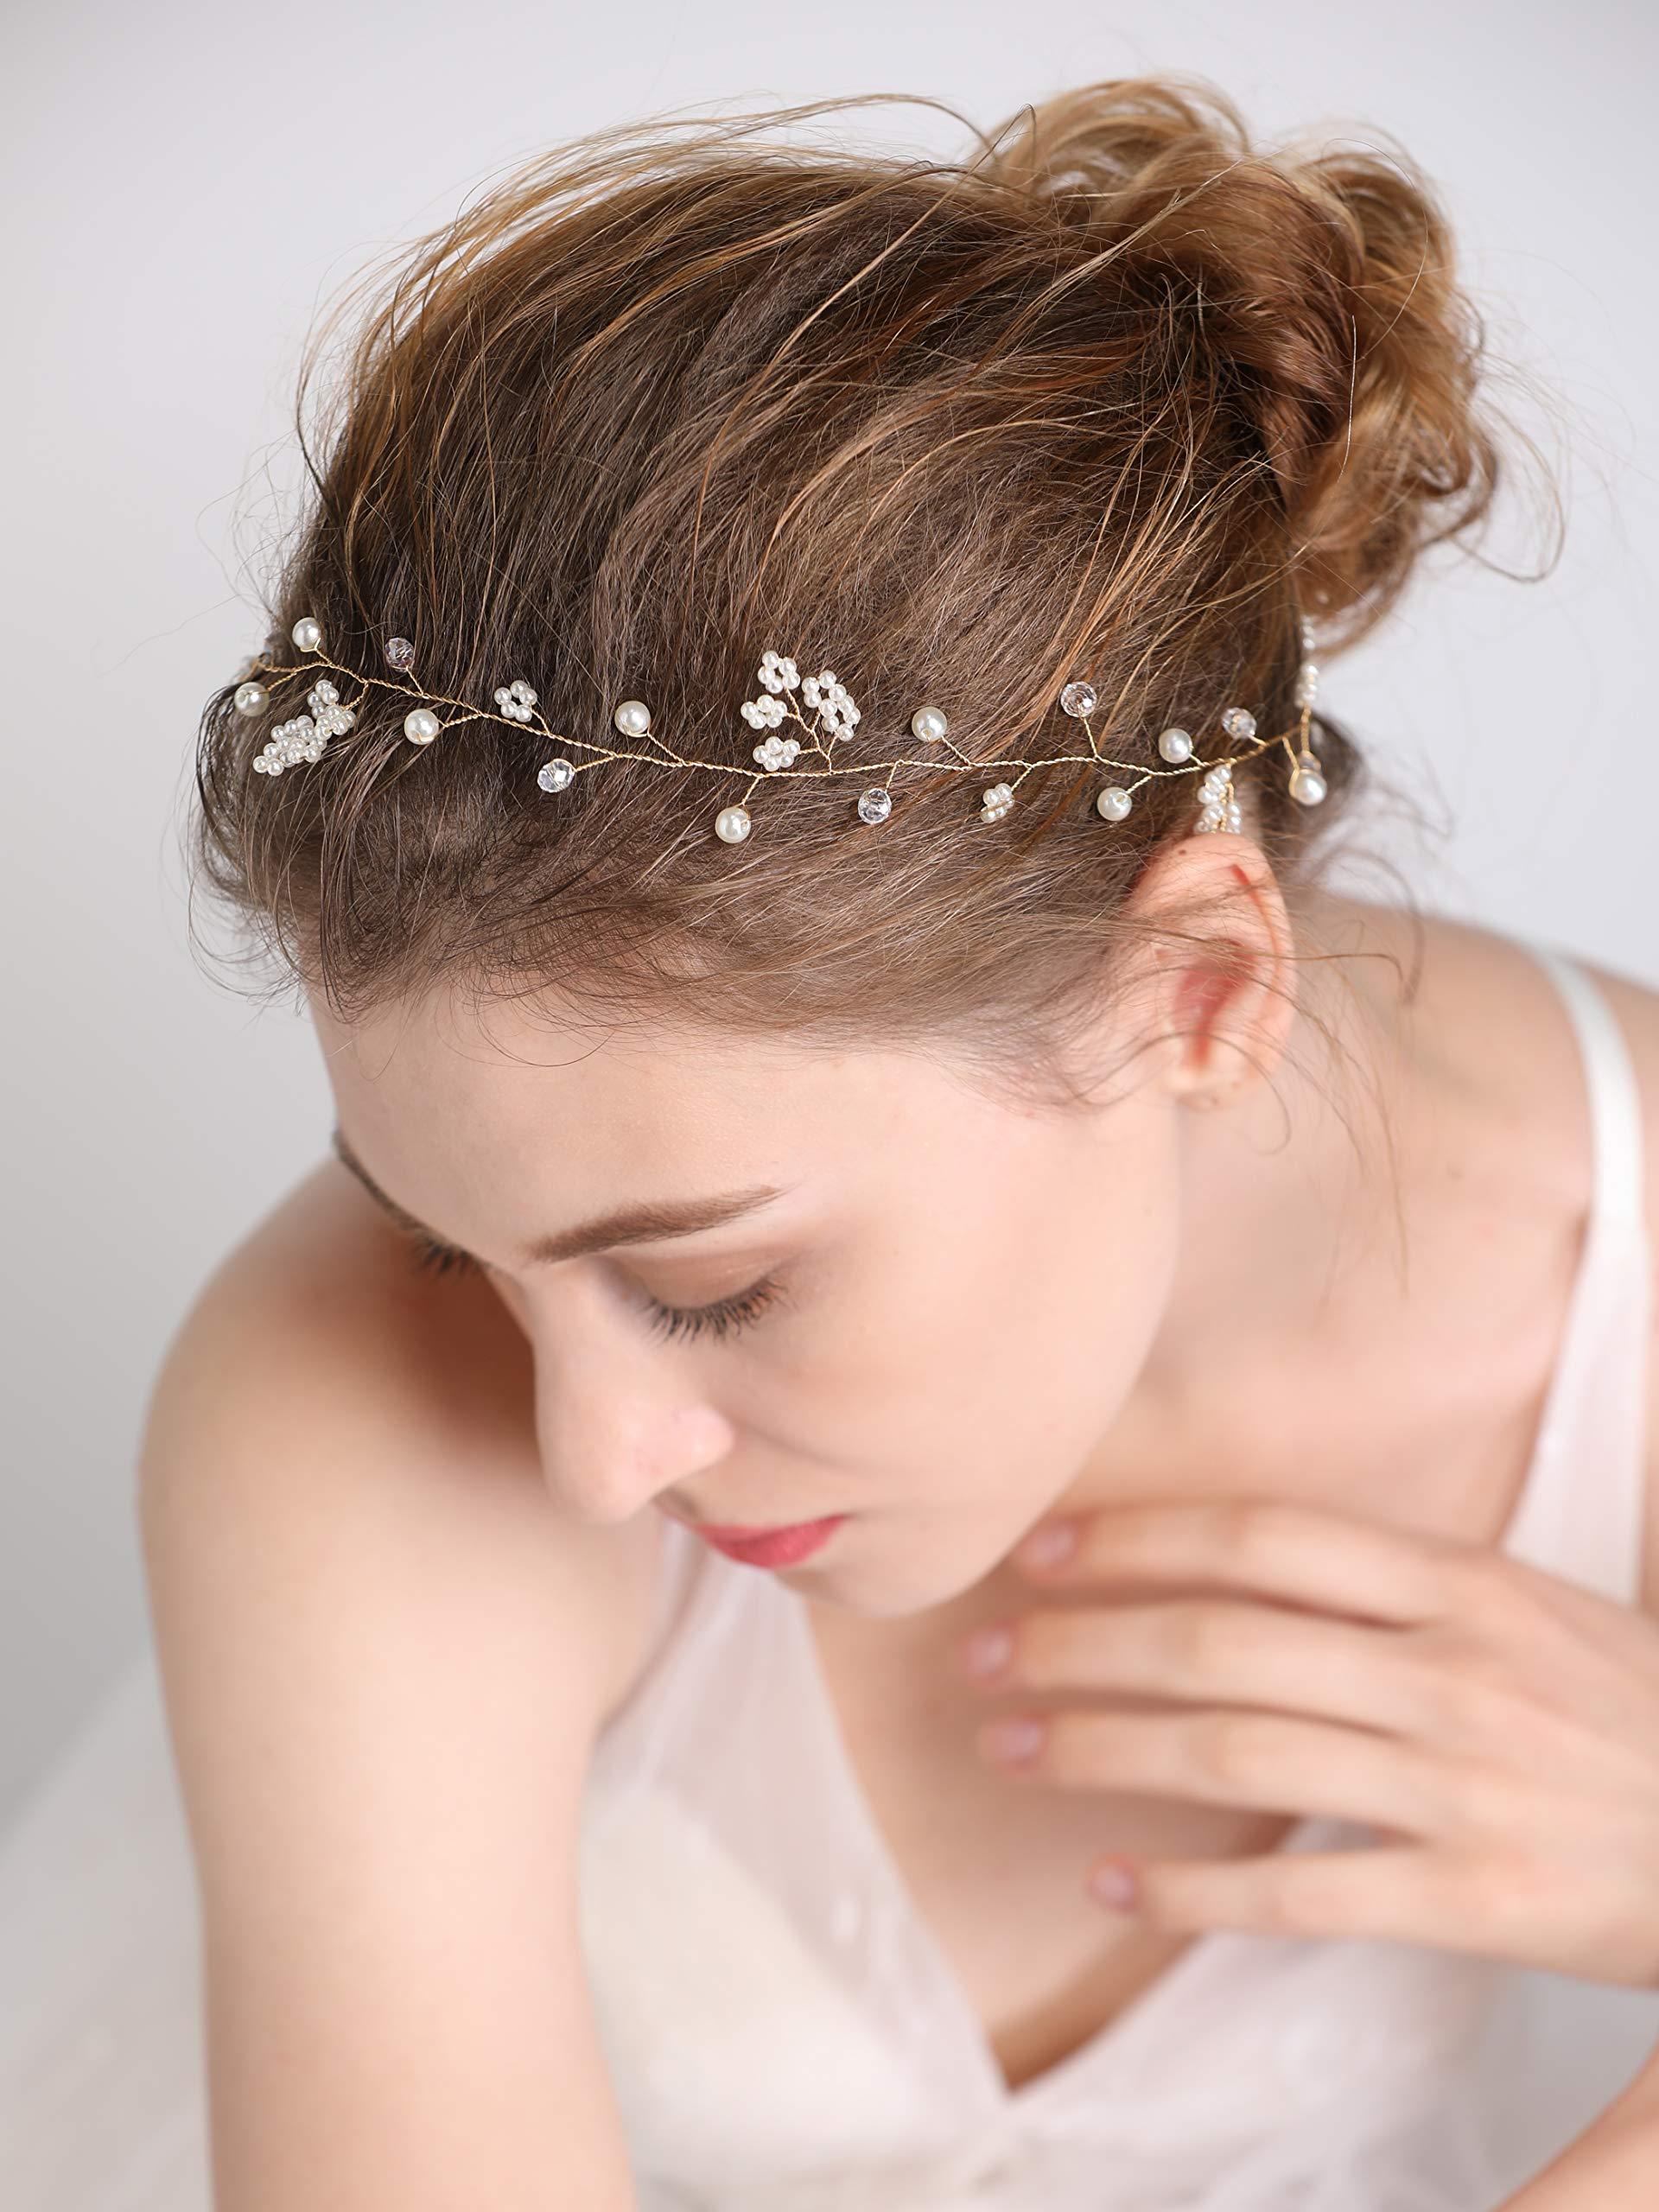 Amazon Fxmimior Bridal Wedding Crystals Long Hair Vine Wedding